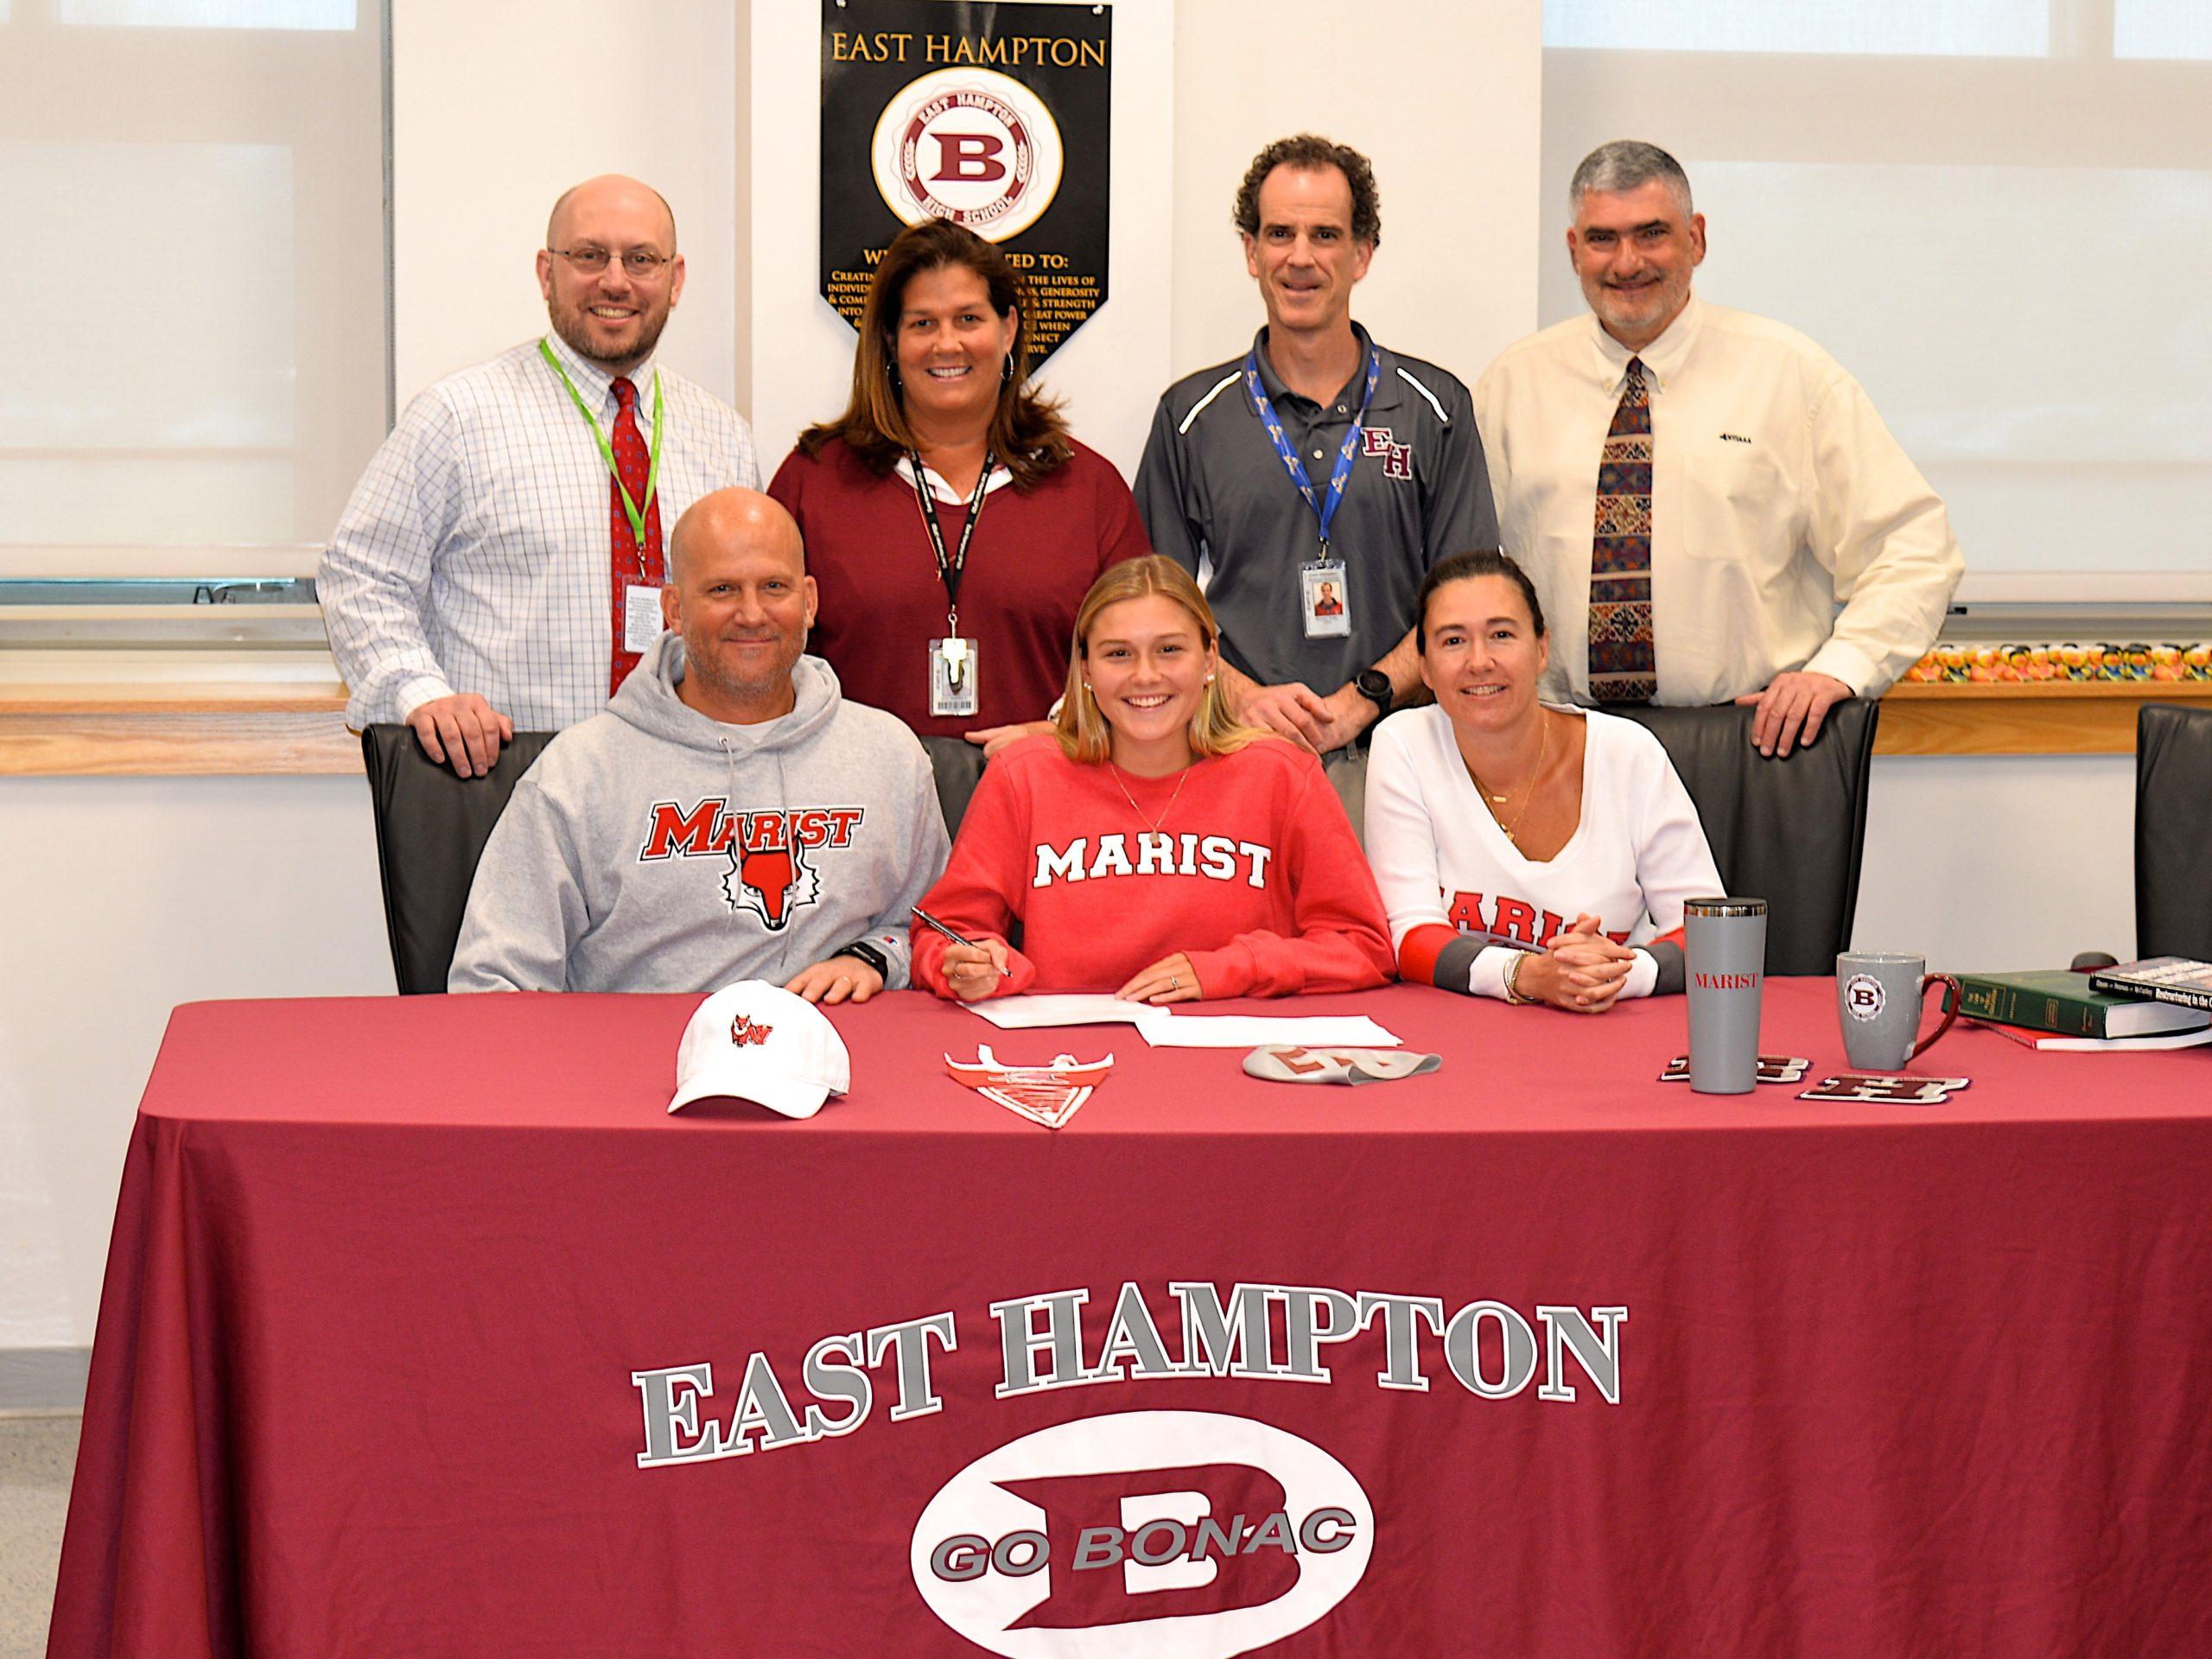 East Hampton High School principal Adam Fine, at top left, with Simone Ritz, swim coach Craig Brierley and athletic director Joe Vasile-Cozzo with Richard, Sophia and Carolina Swanson.